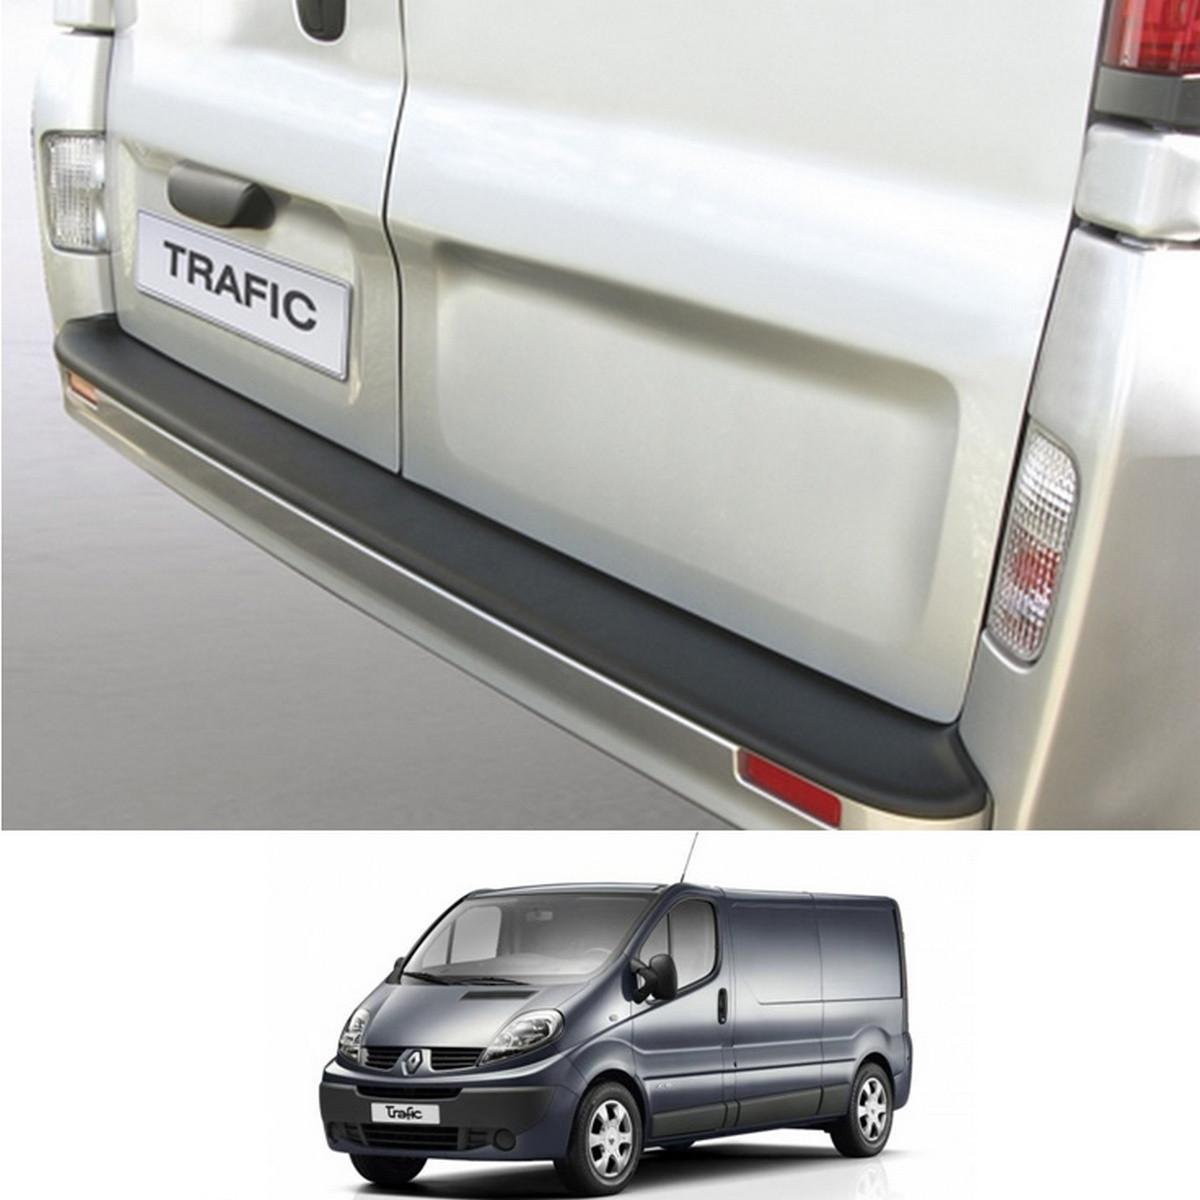 Пластиковая защитная накладка на задний бампер для Renault Trafic 2006-2014